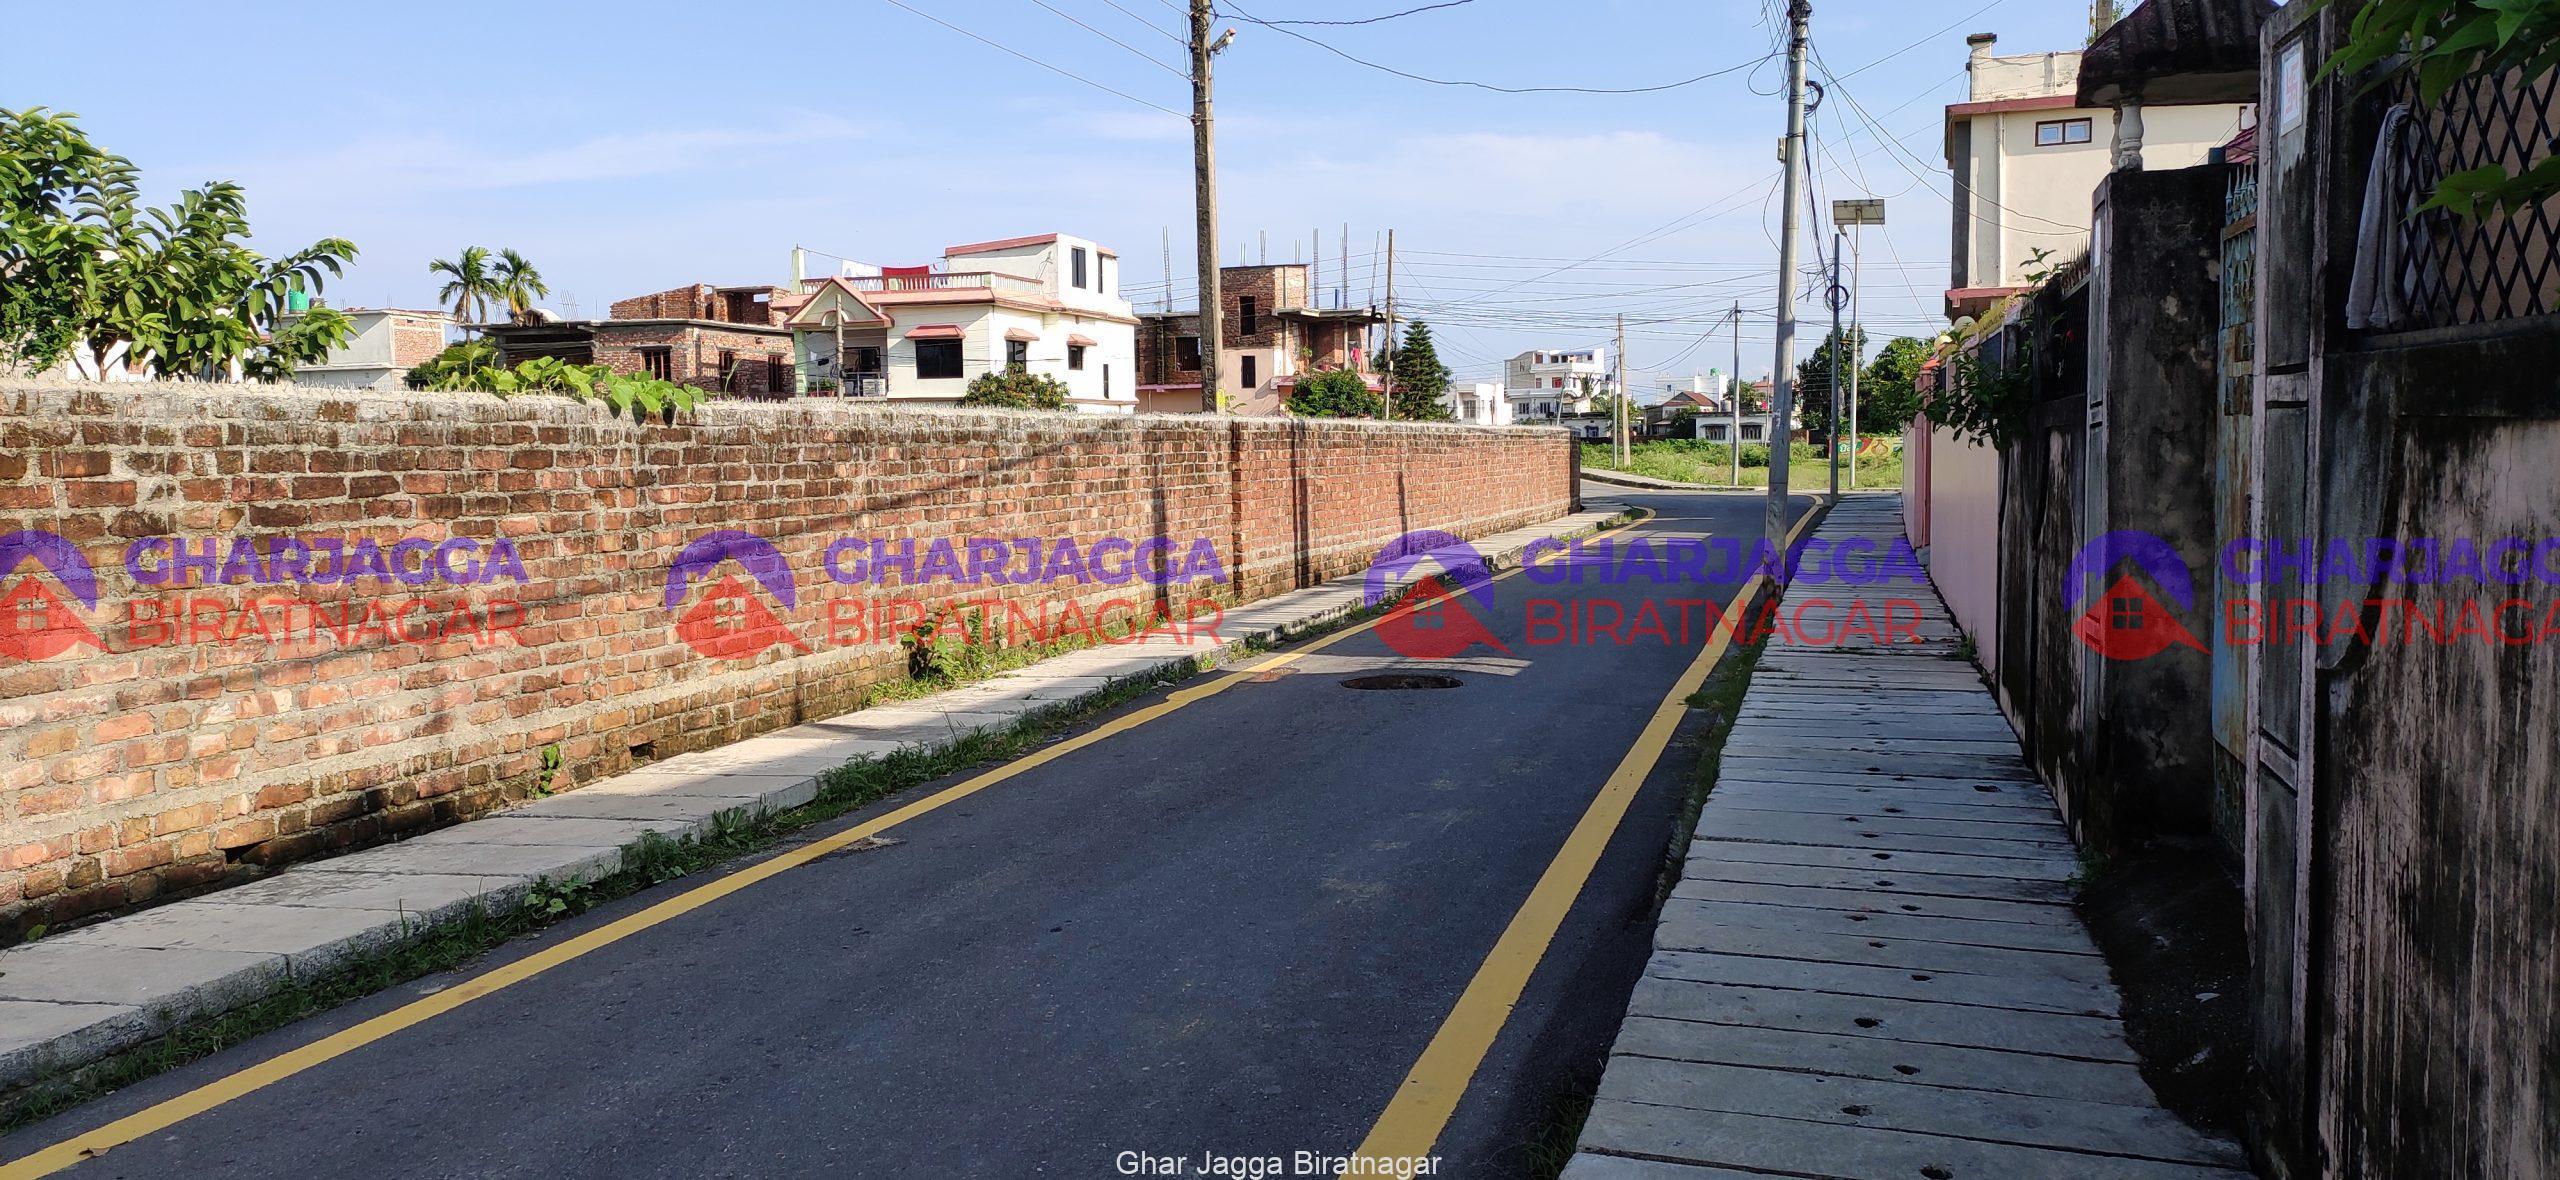 13.5 Dhur land on Sale at Tintoliya Biratnagar   बिराटनगरमा घडेरी बिक्रीमा